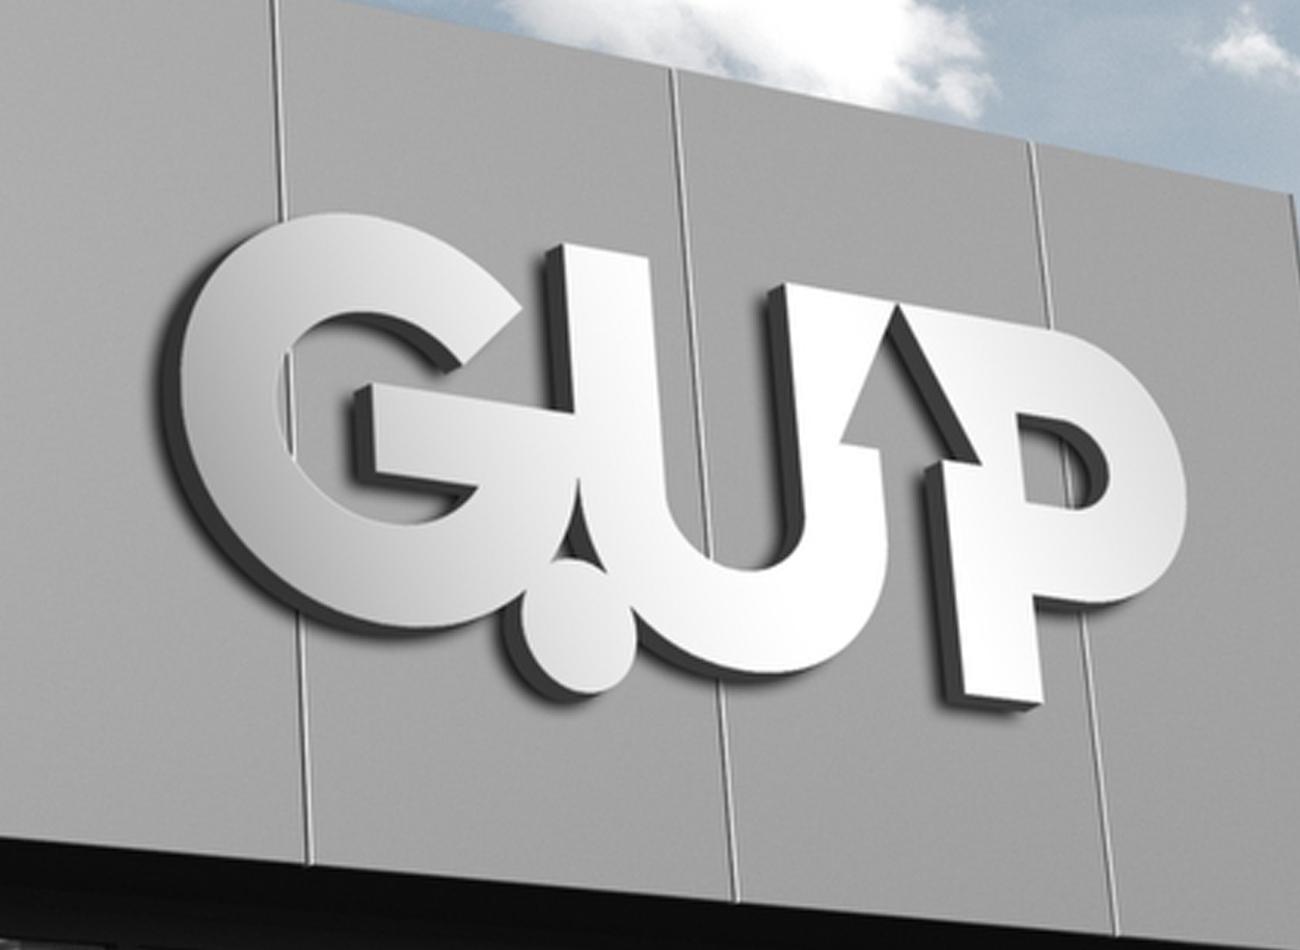 g-up-video-platform-wordmark-typographic-logo-design-agent-orange-south-african-branding-agency.jpg